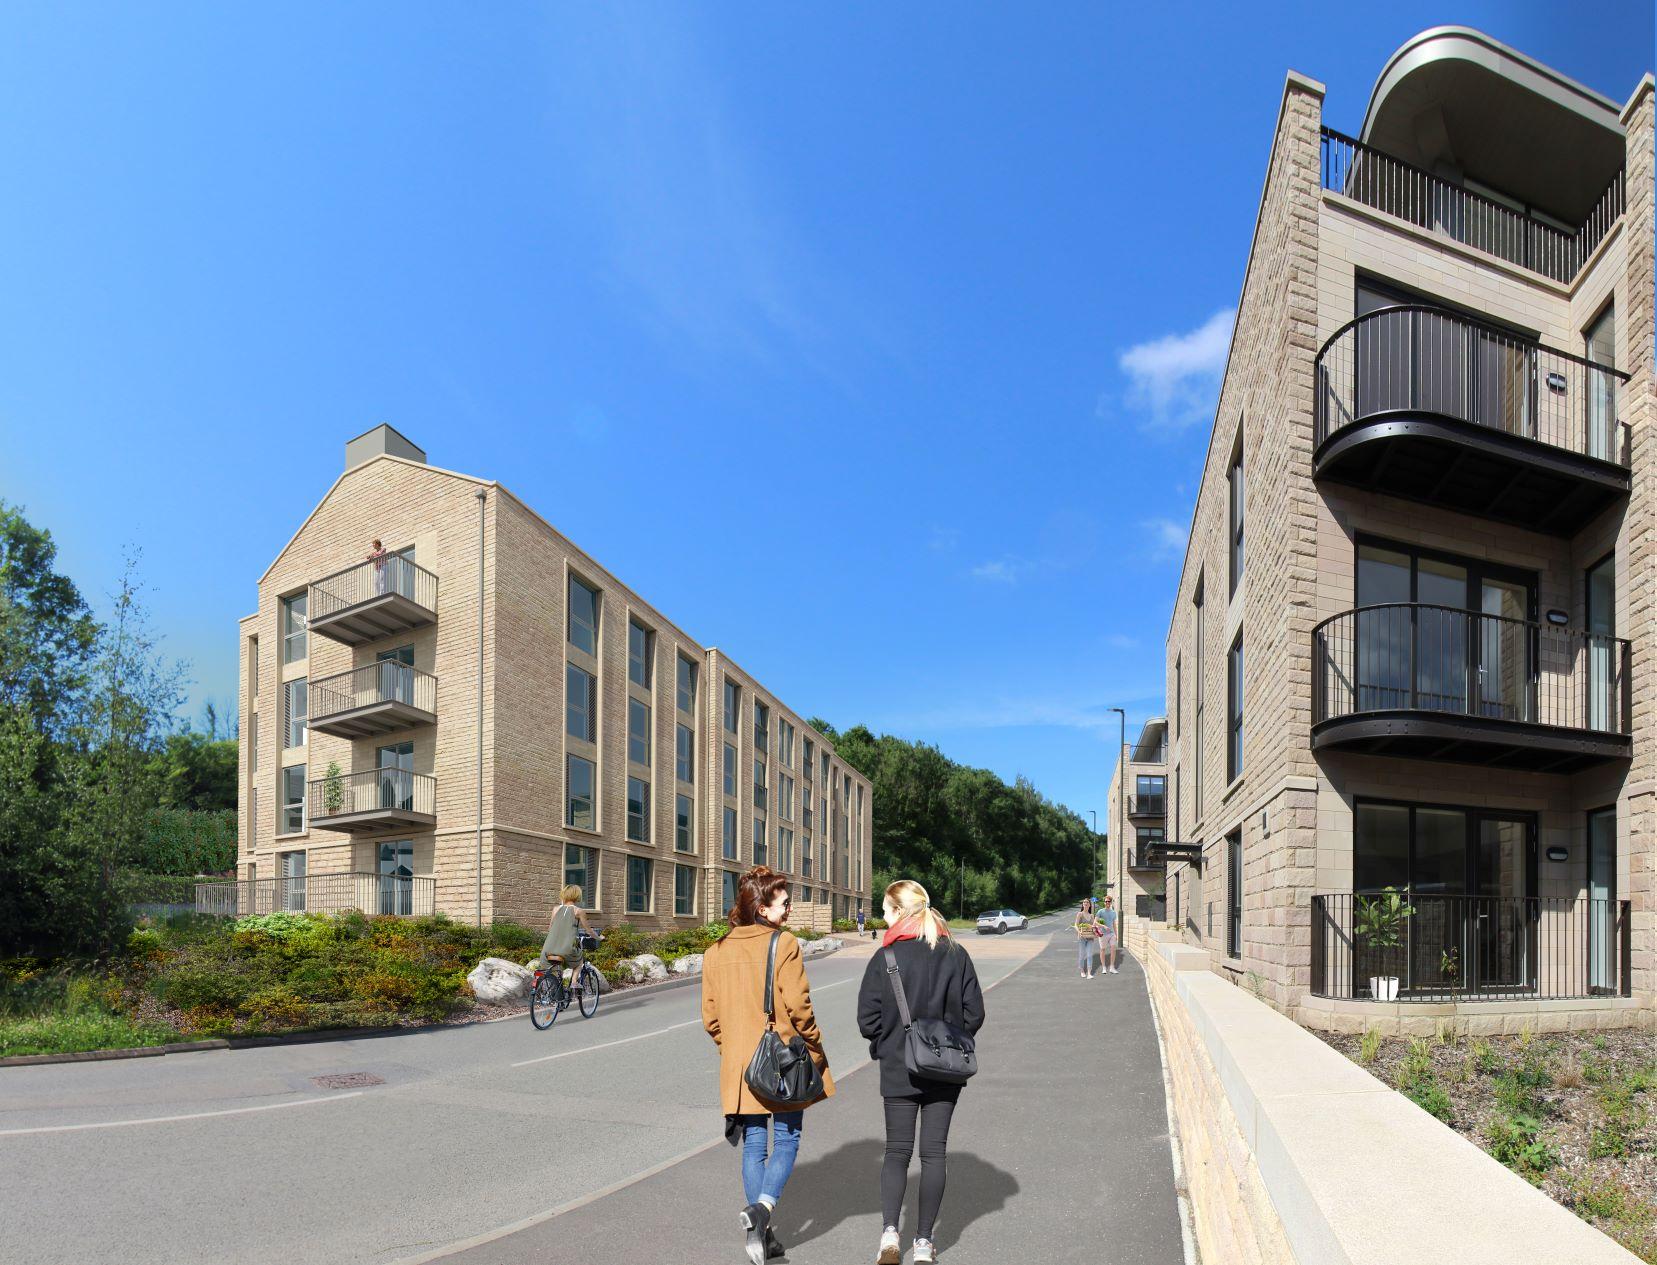 Derbyshire construction firm celebrates further contract win at prestigious Matlock Spa development